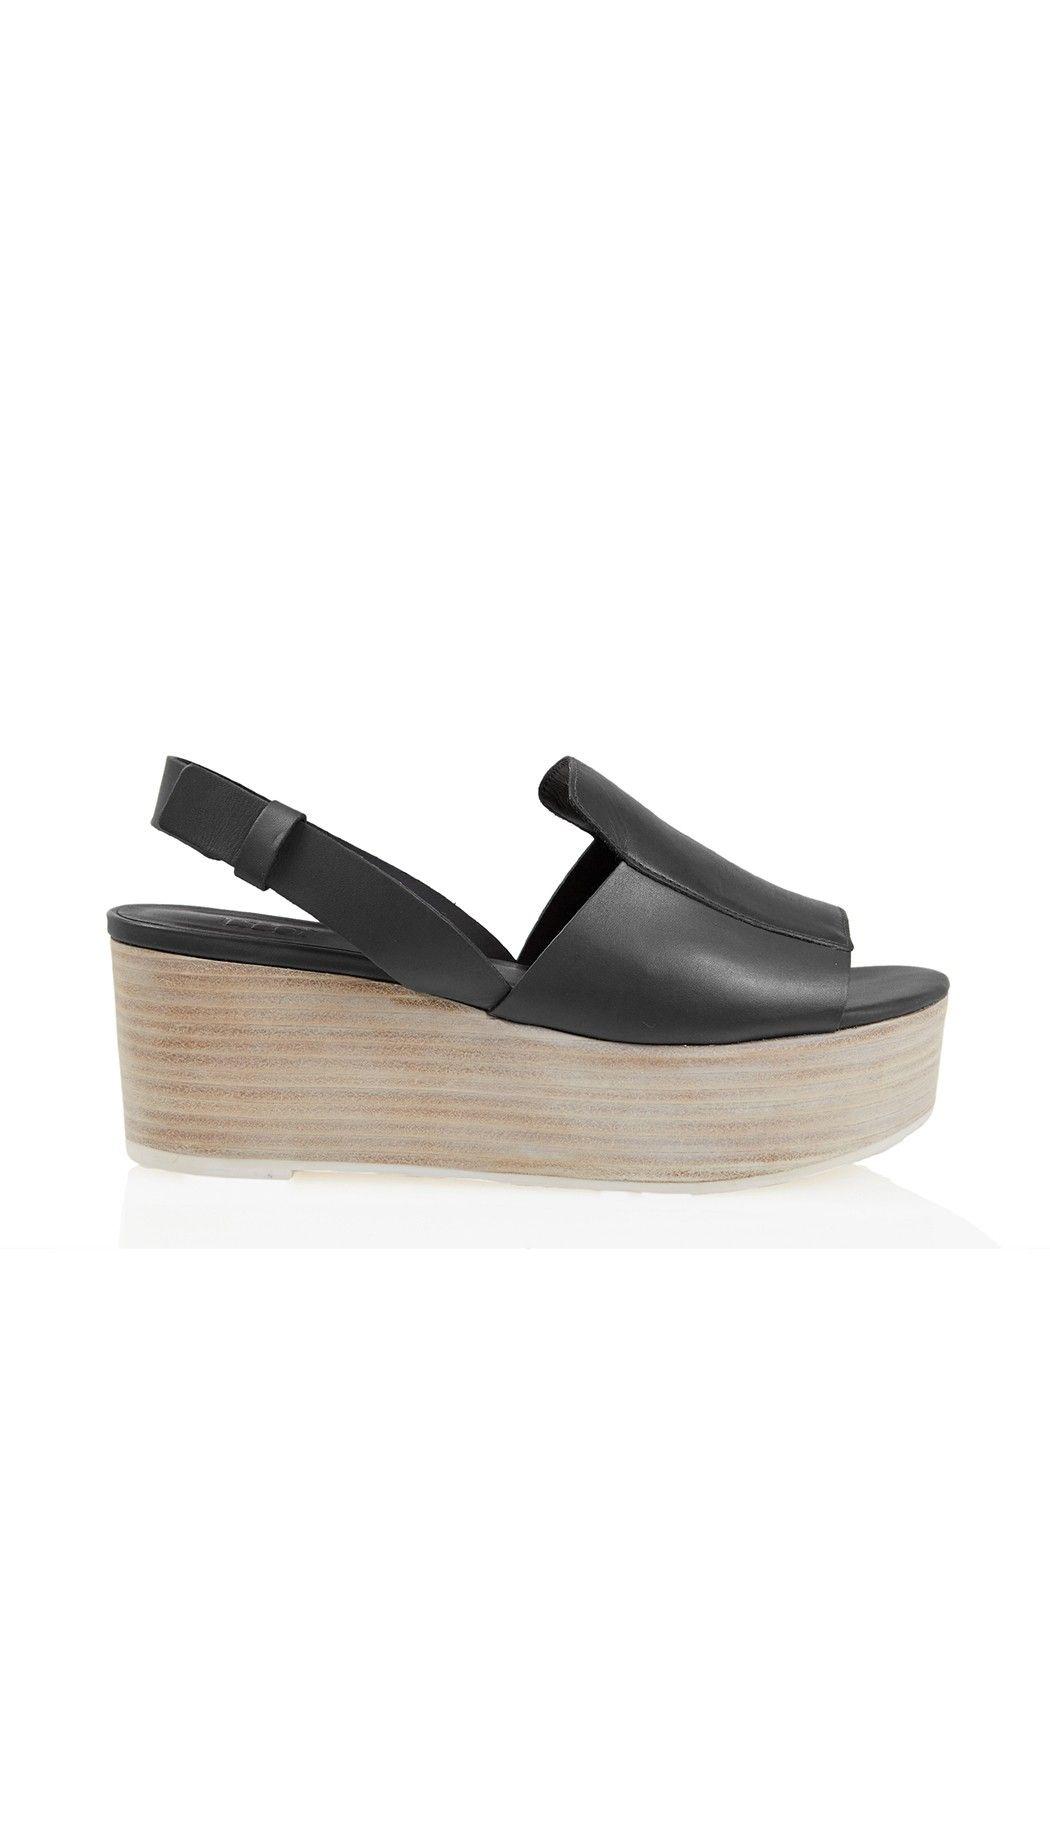 afa1ad1a99c Tibi - Alex Platform Sandals Black Platform Sandals